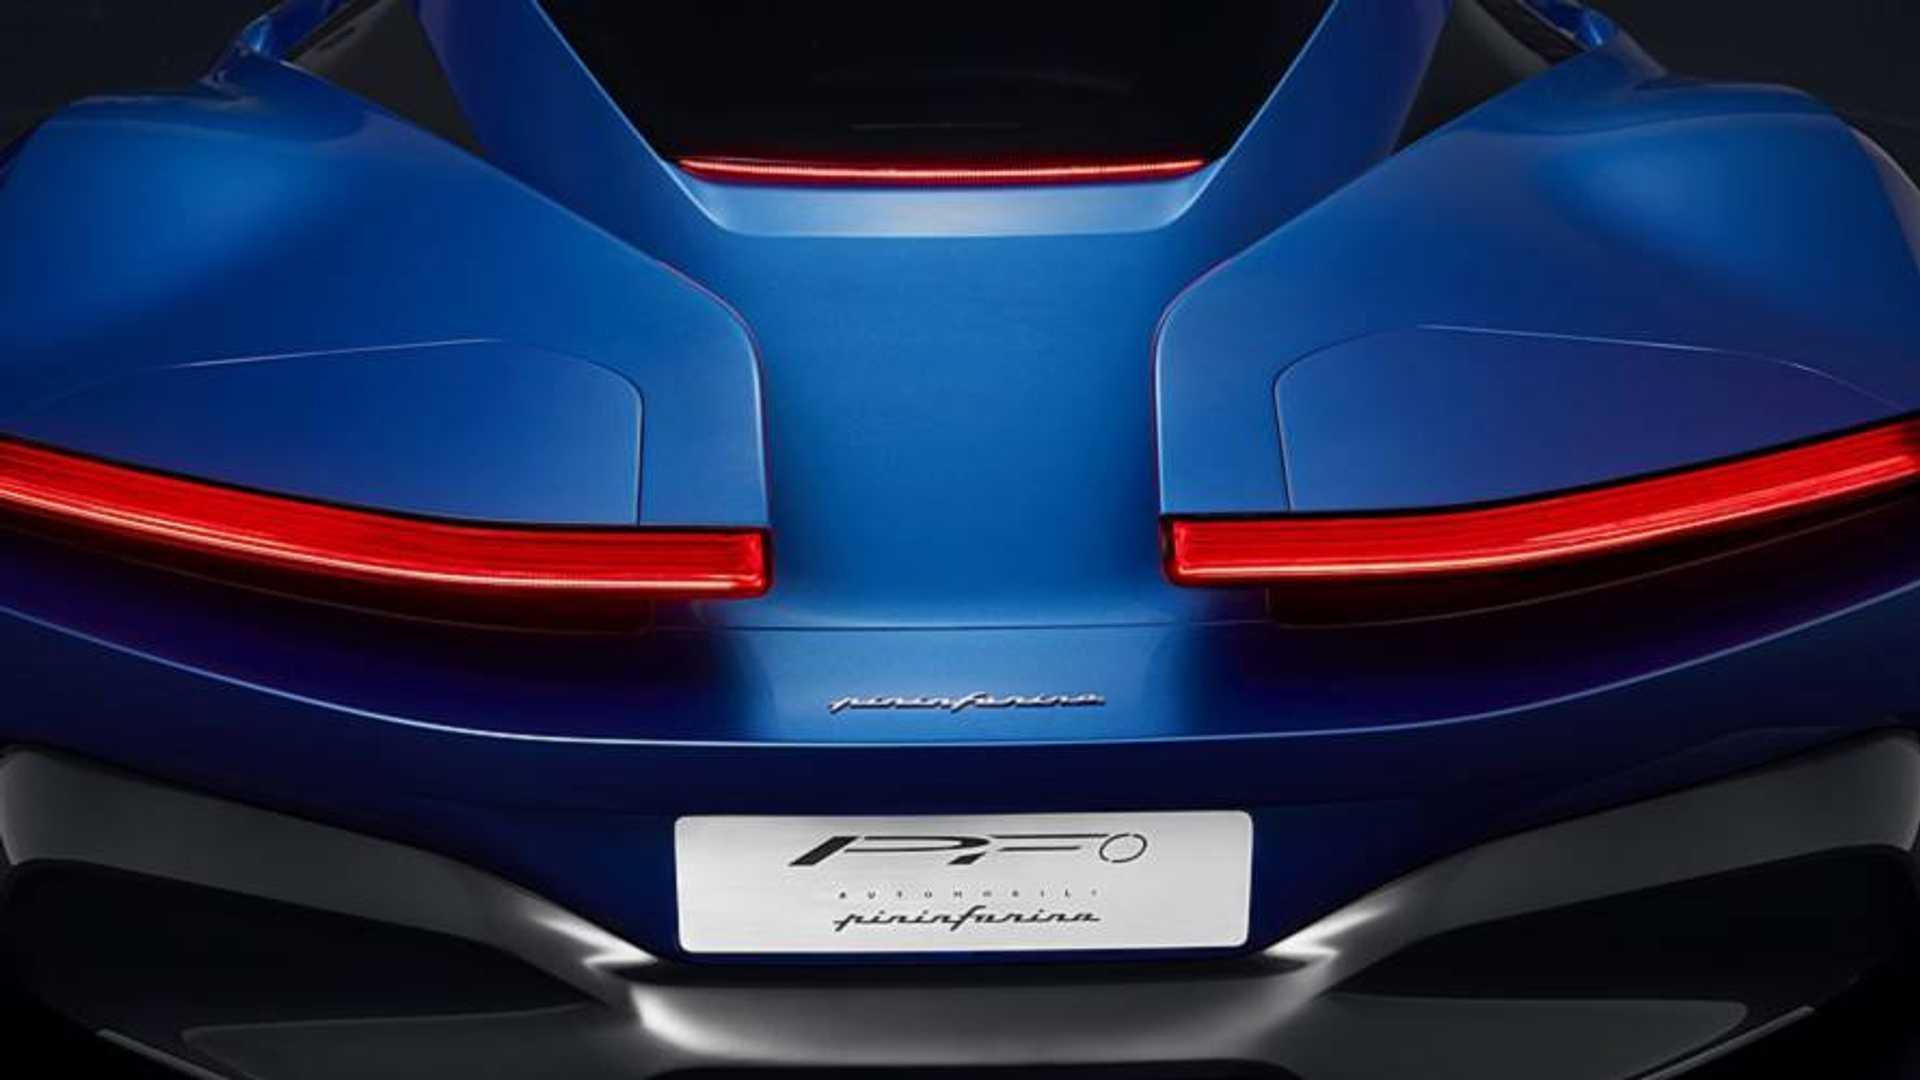 2018 - [Pininfarina] PF0 Concept / Battista  Pininfarina-pf0-teaser